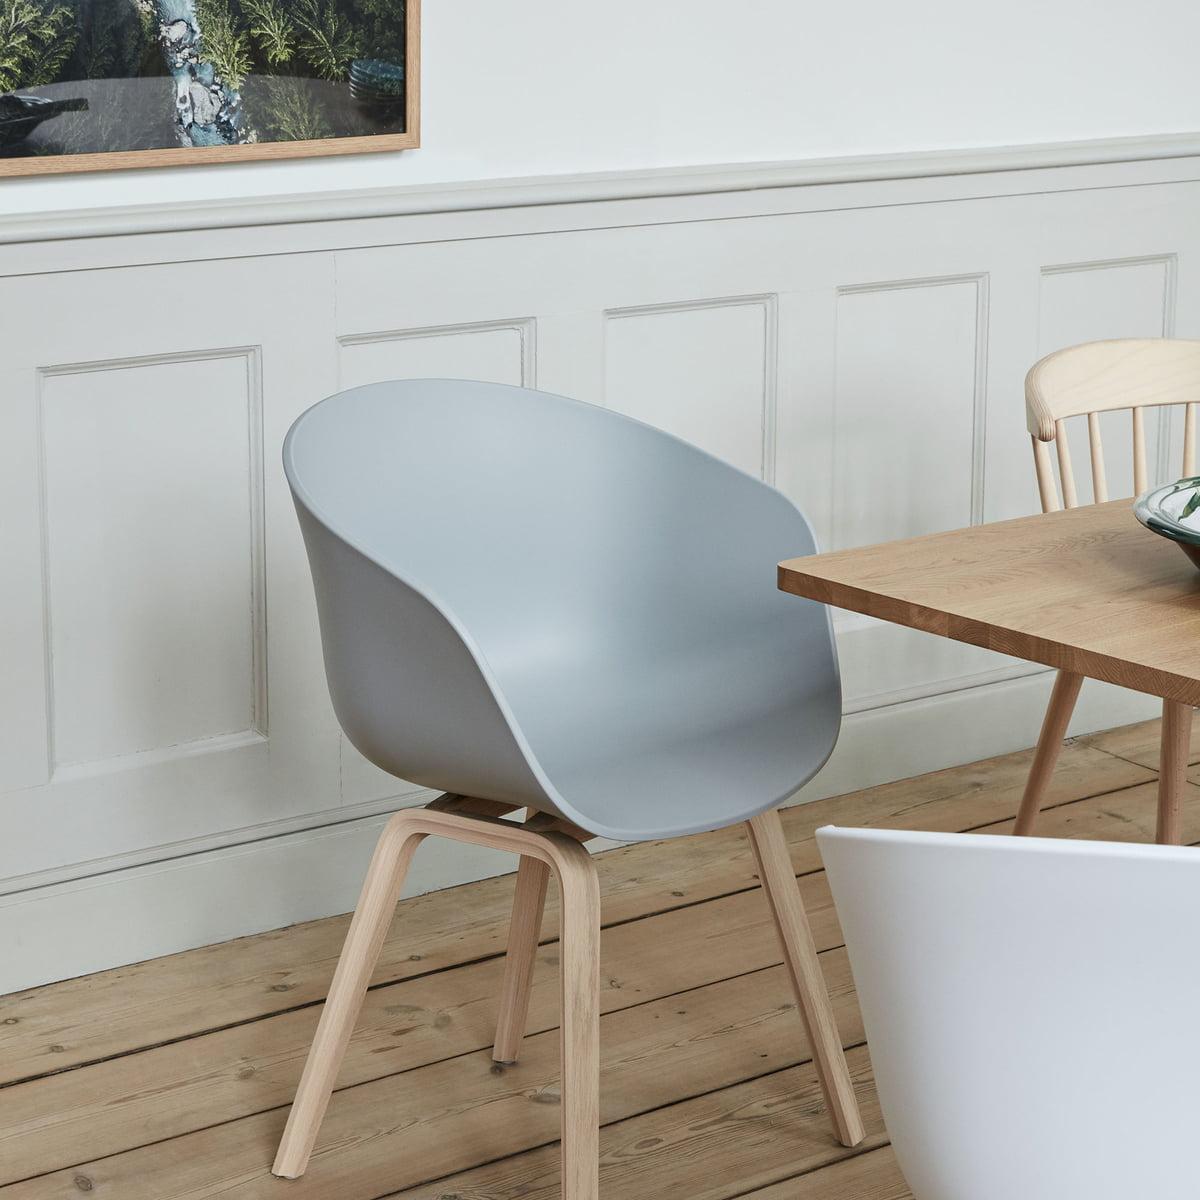 Hay About a chair aac 22, chêne savonné blanc